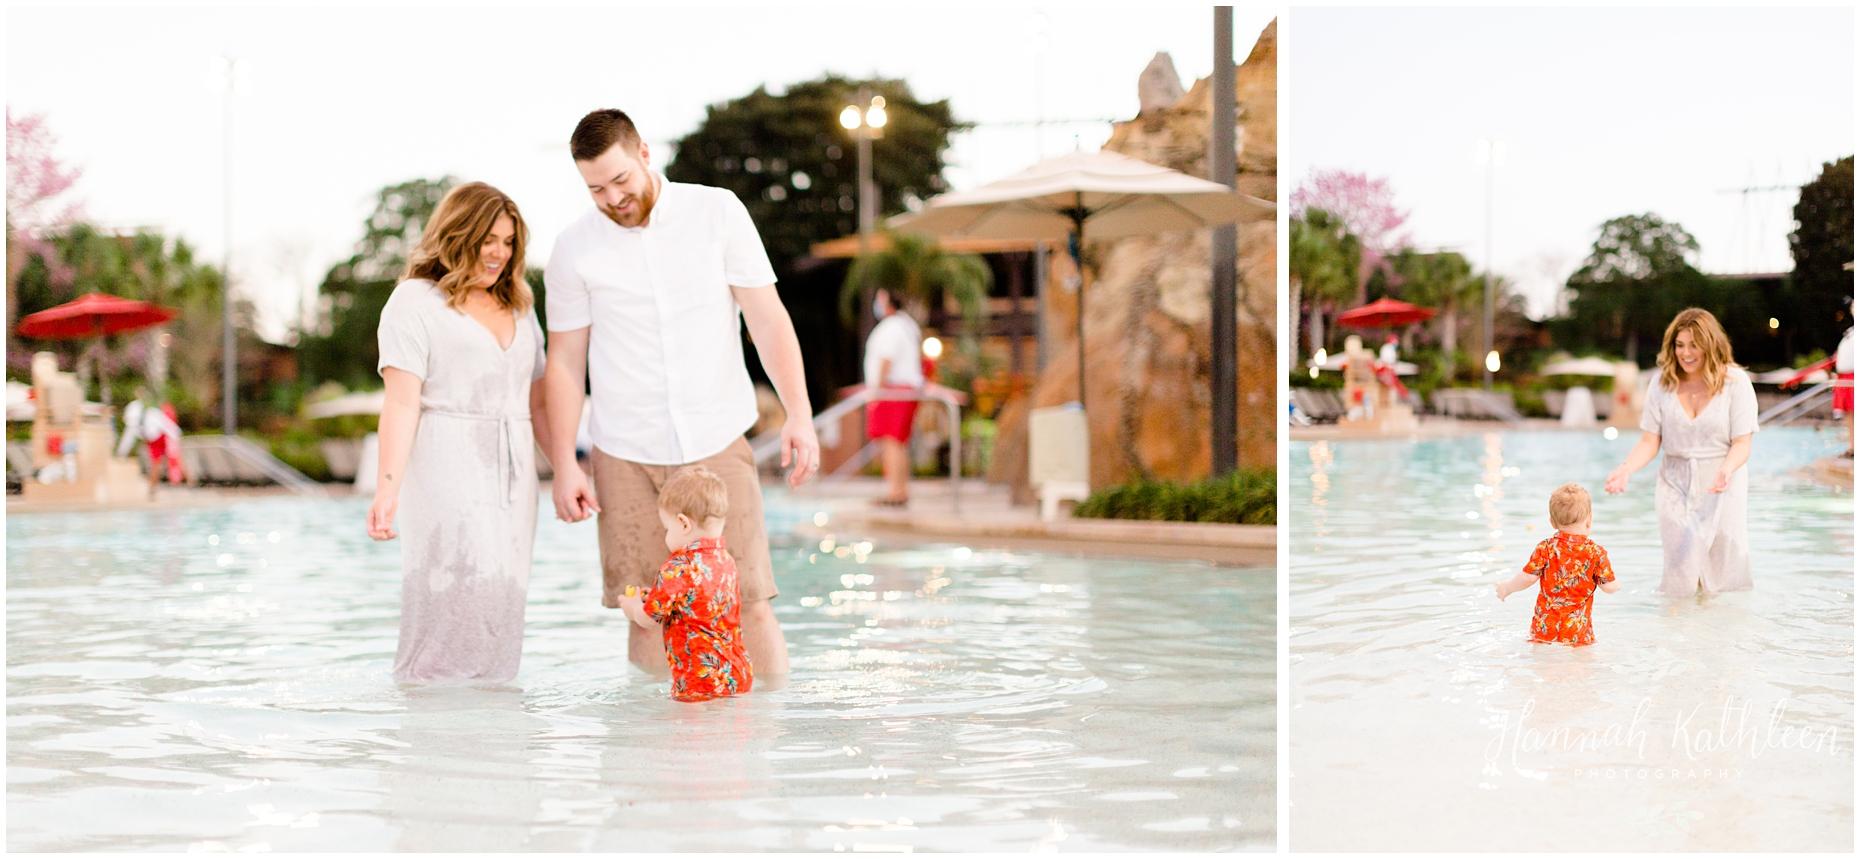 disney_world_polynesian_resort_pool_beach_family_photography_photos